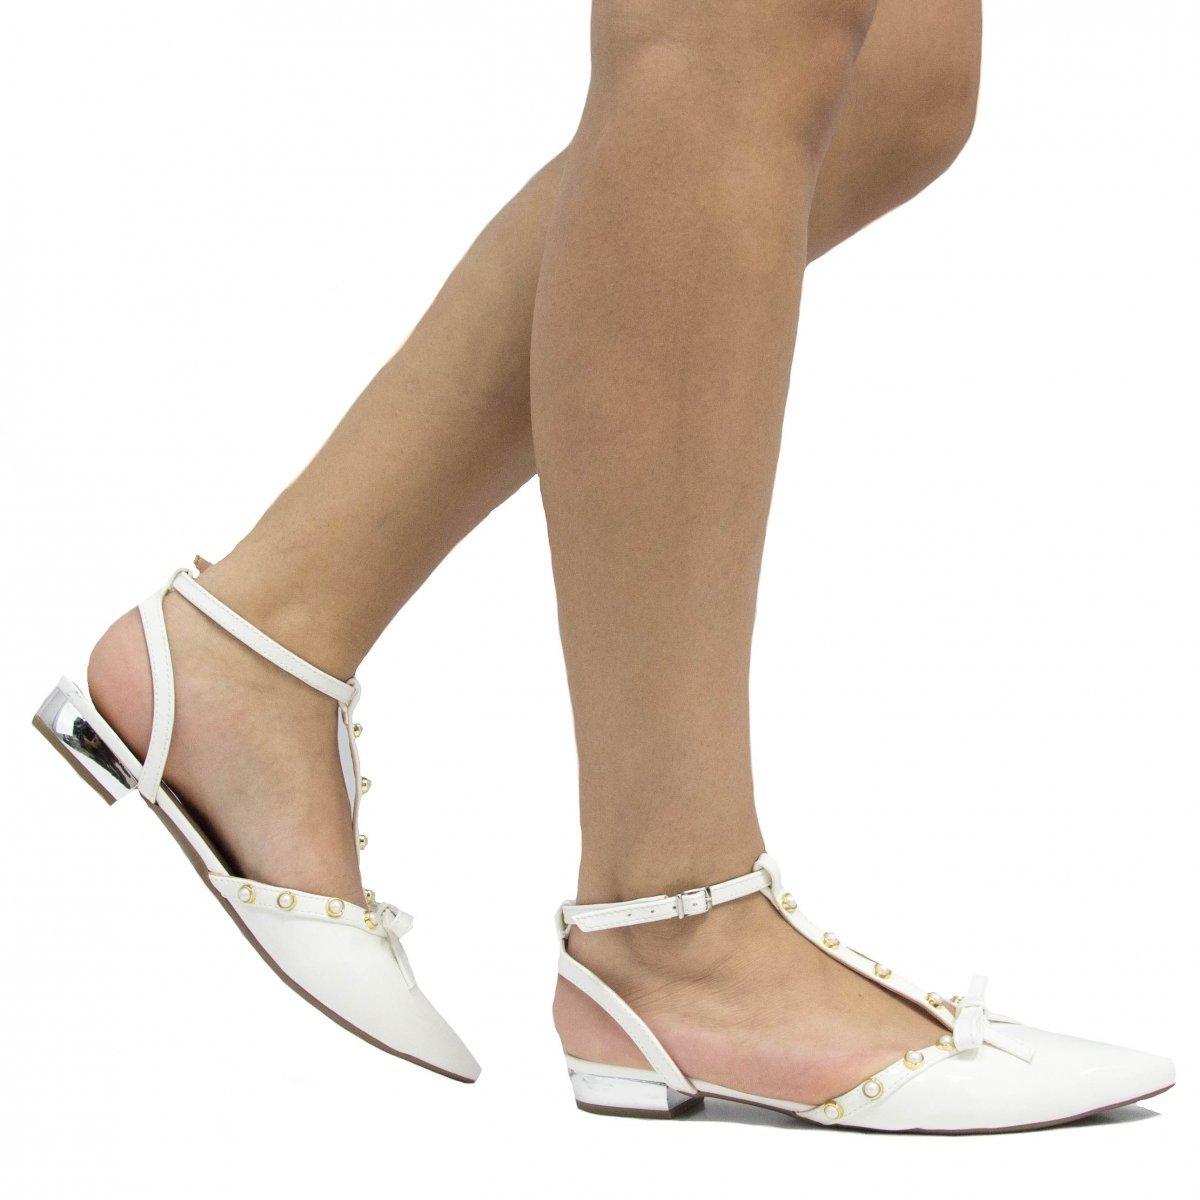 Sapatilha Feminina Zariff Zariff Laço Verniz Feminina Shoes Laço Shoes Sapatilha Branco Verniz wvYSaXqxn